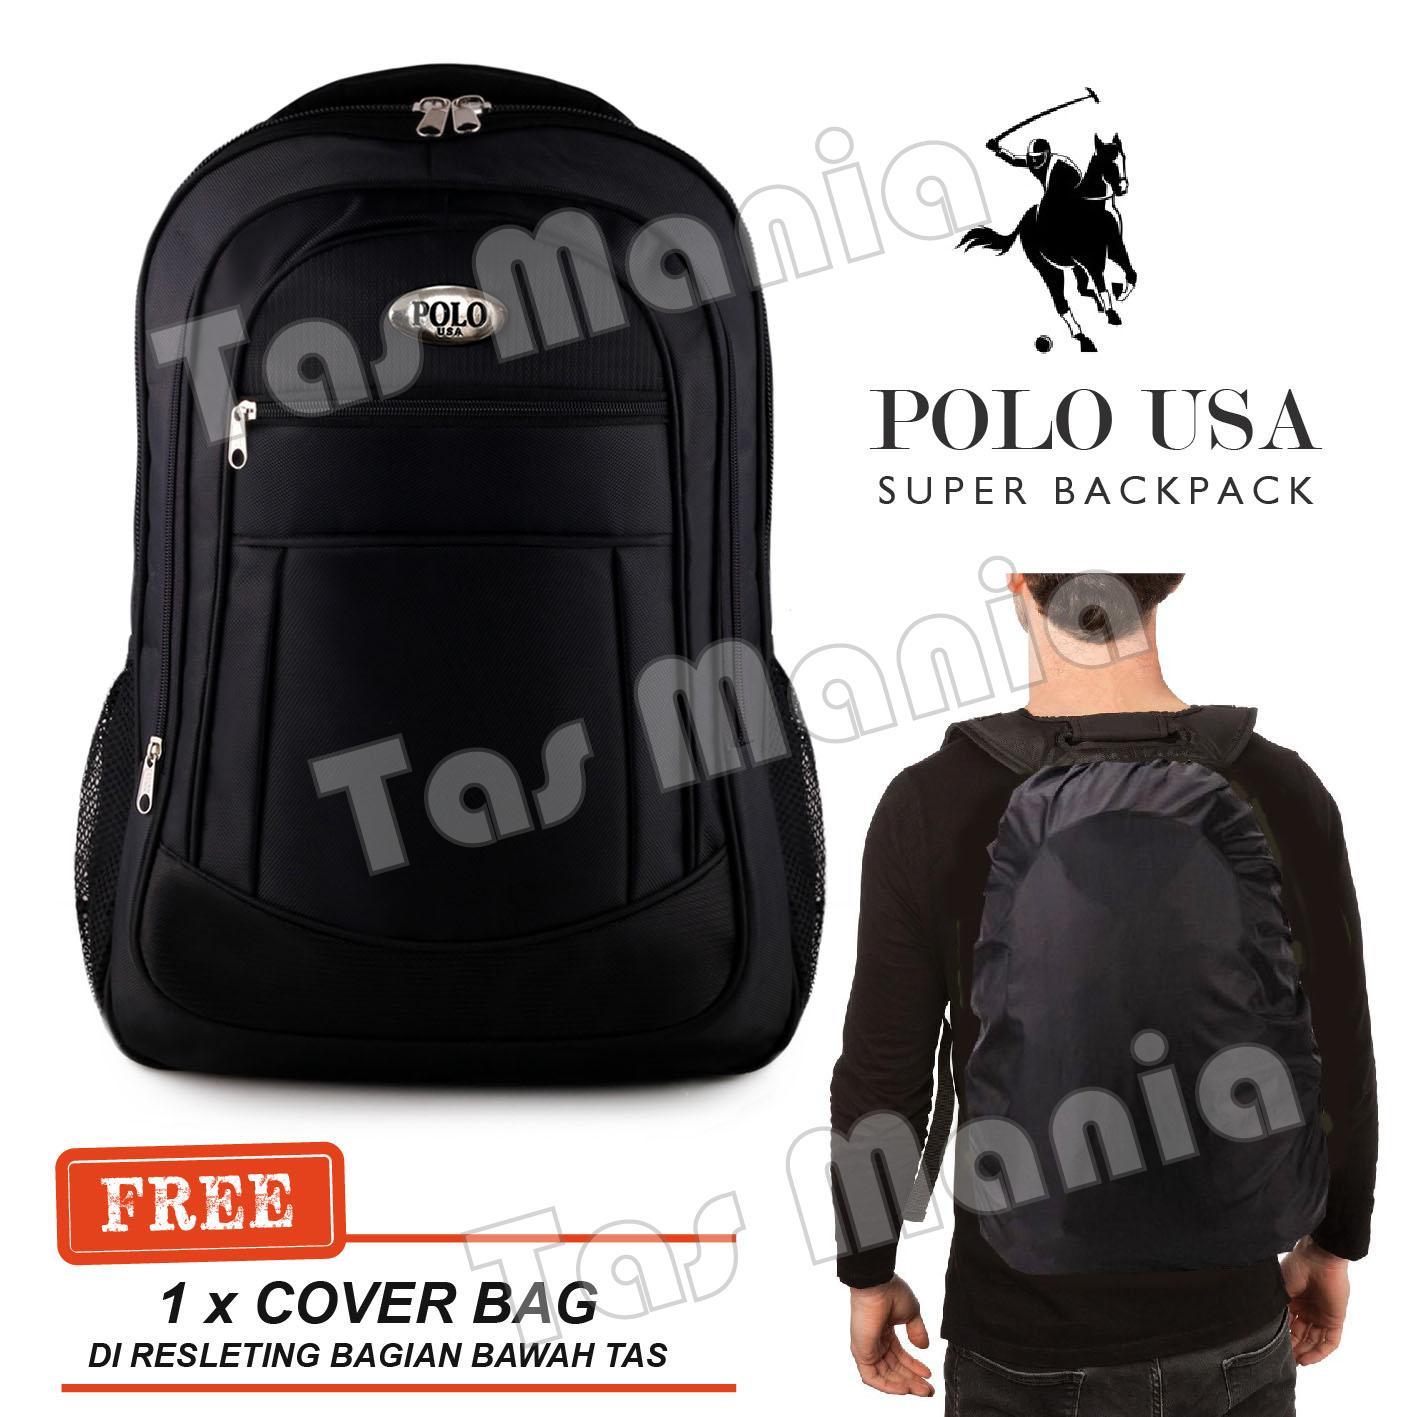 Tas Ransel Pria Polo USA Laptop Backpack + FREE Raincover Promo Diskon Import  Kulit Tas Kantor 565ff9c4b9